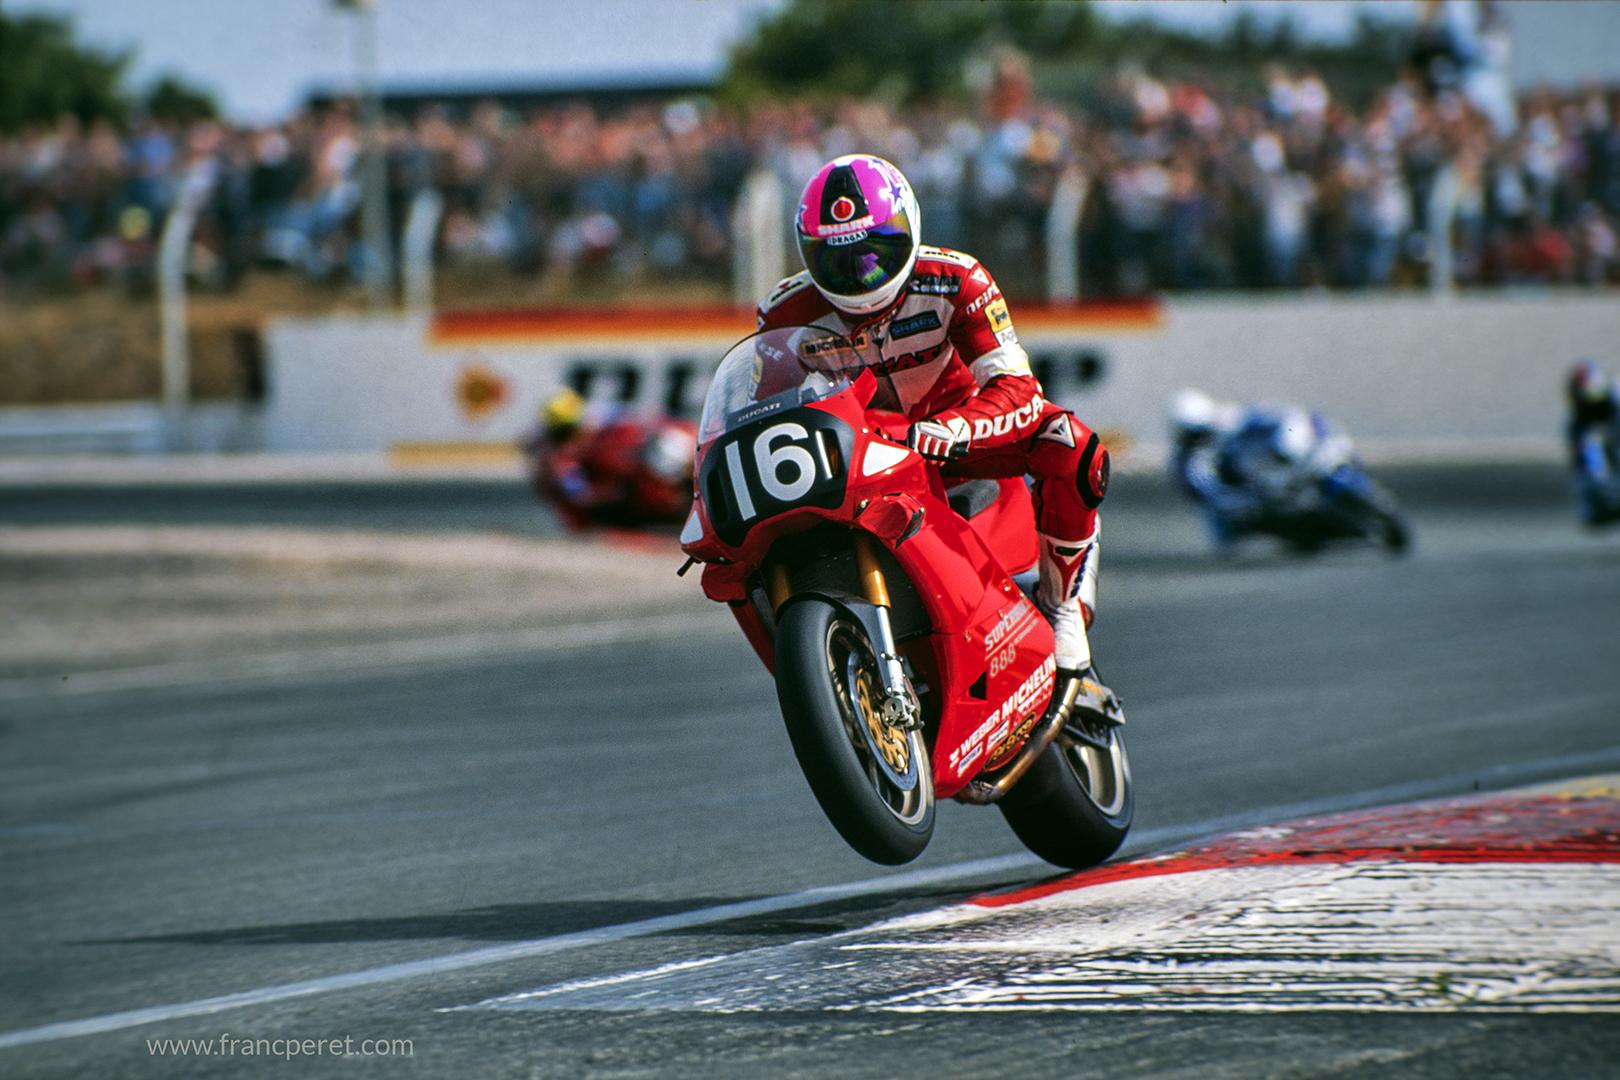 Speed racer taking of